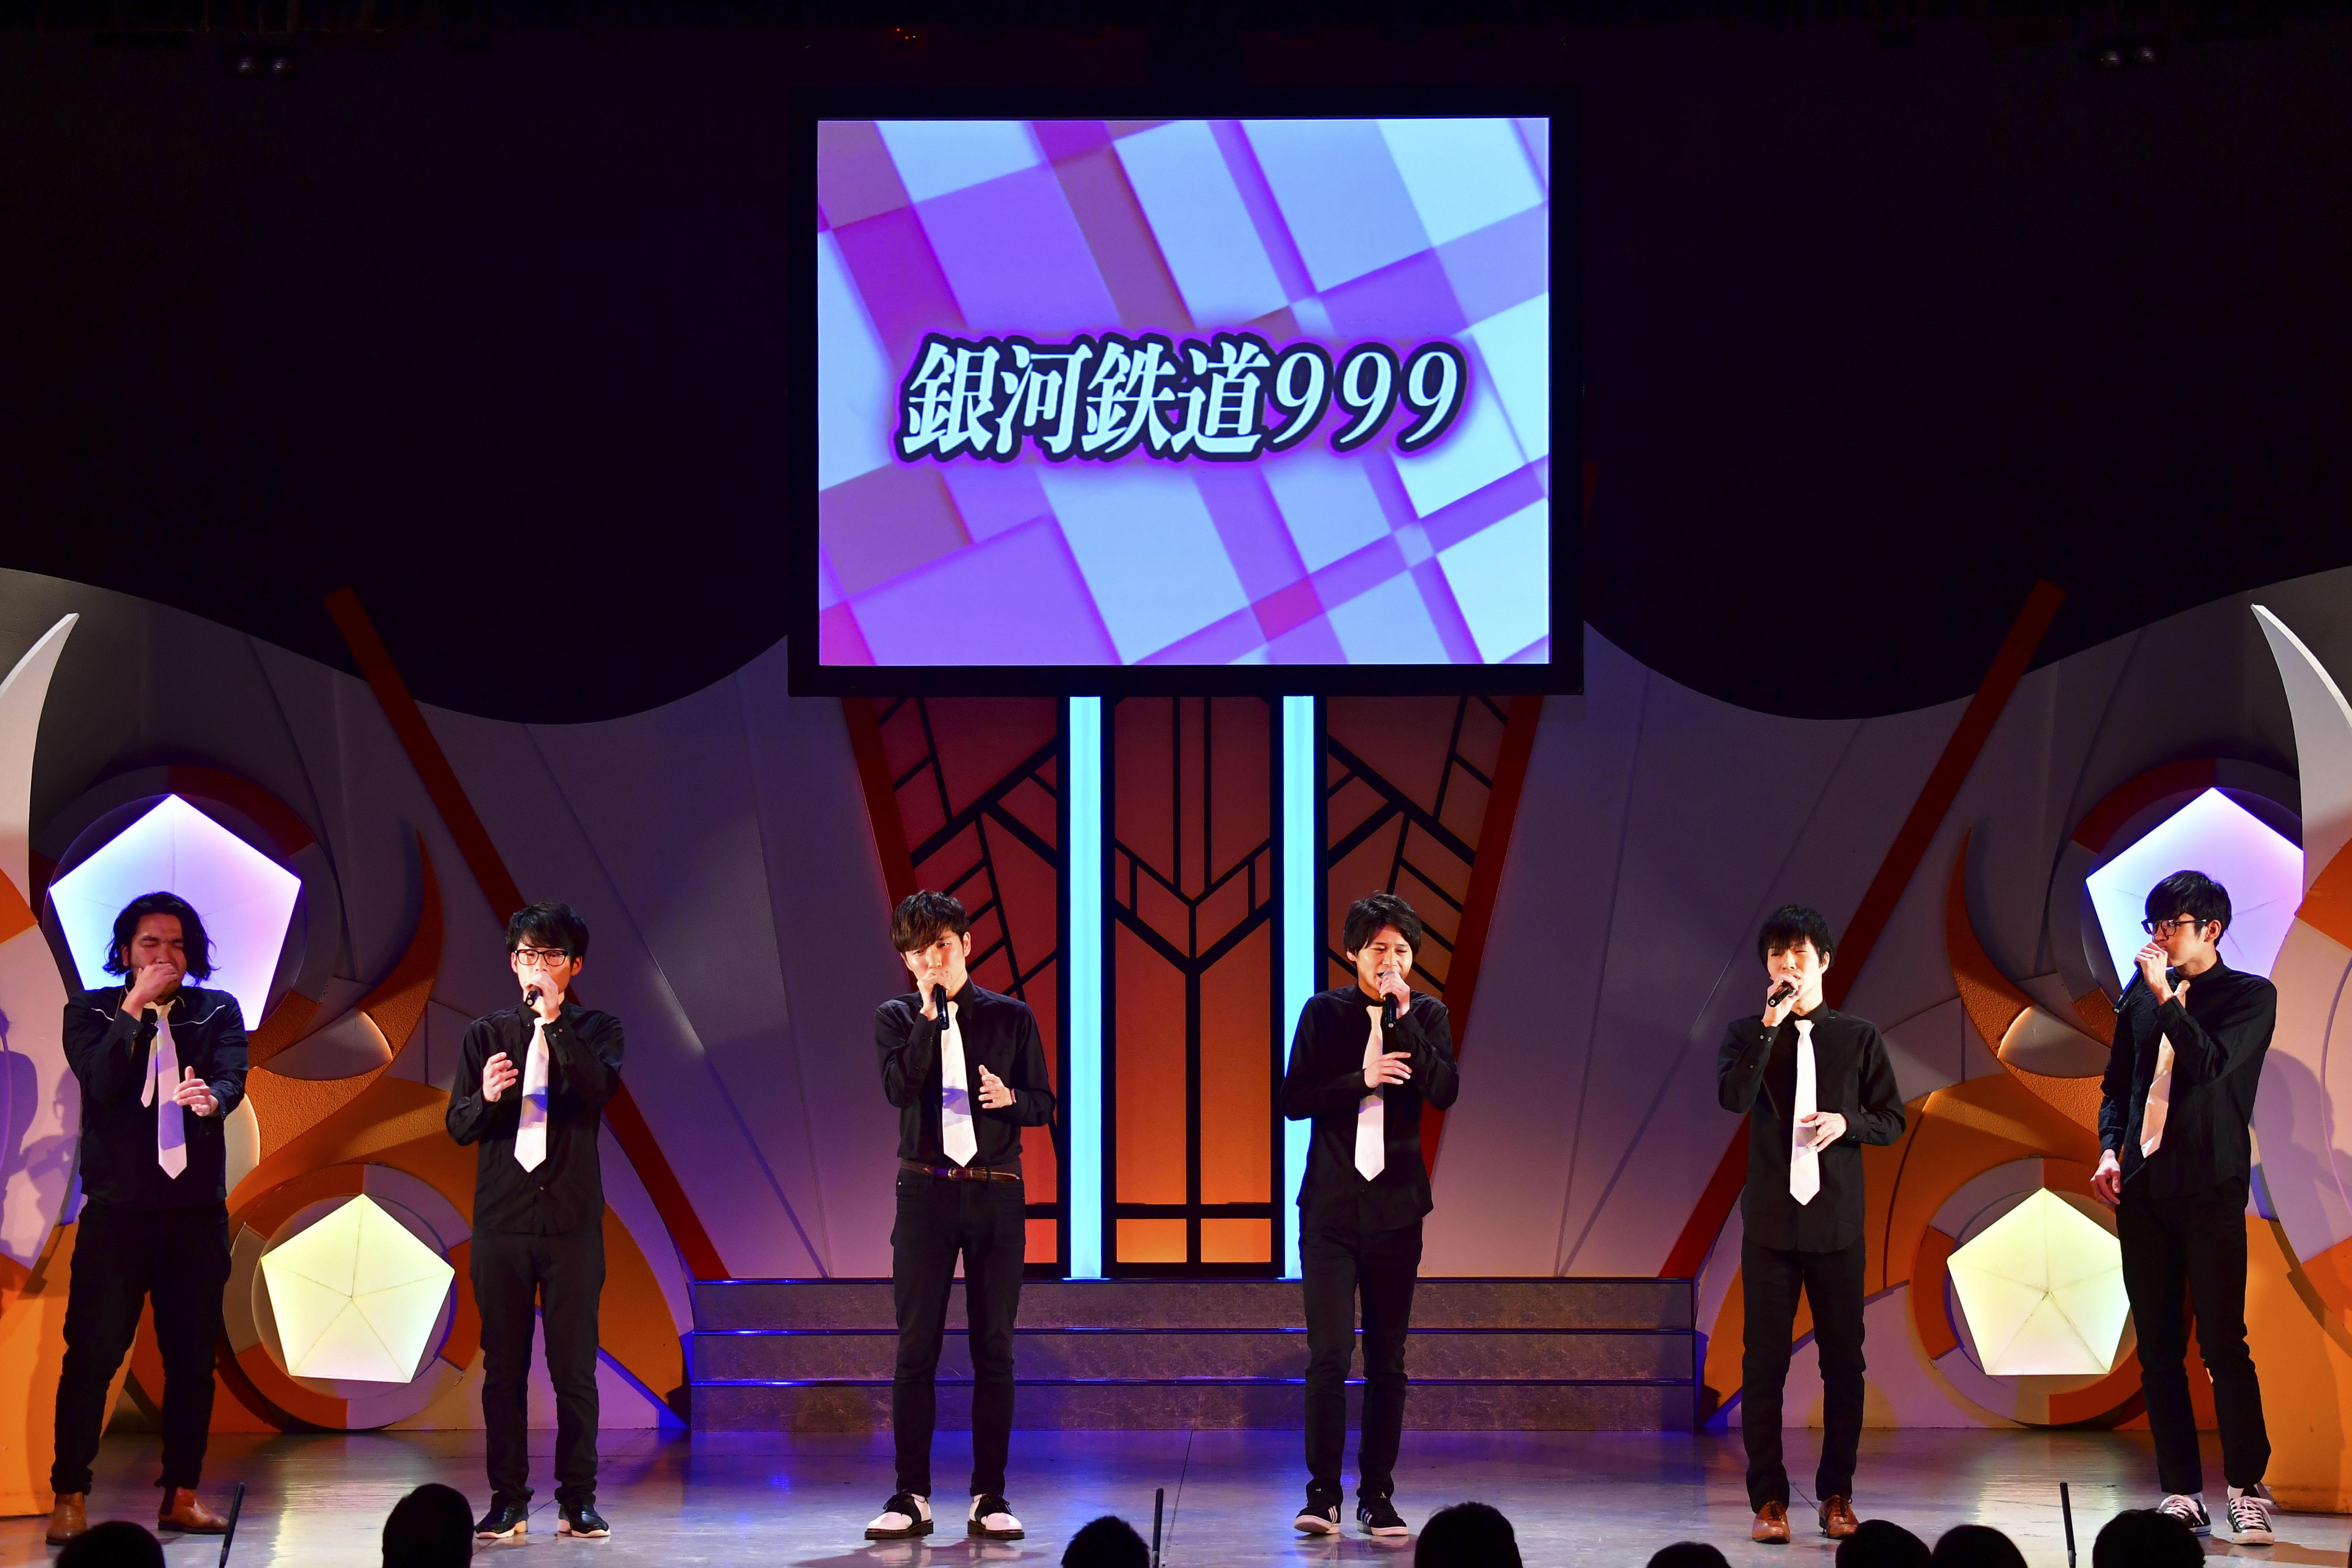 http://news.yoshimoto.co.jp/20171201190217-8f86b382a29d0741b791ff996bd38cd5ac2e5102.jpg